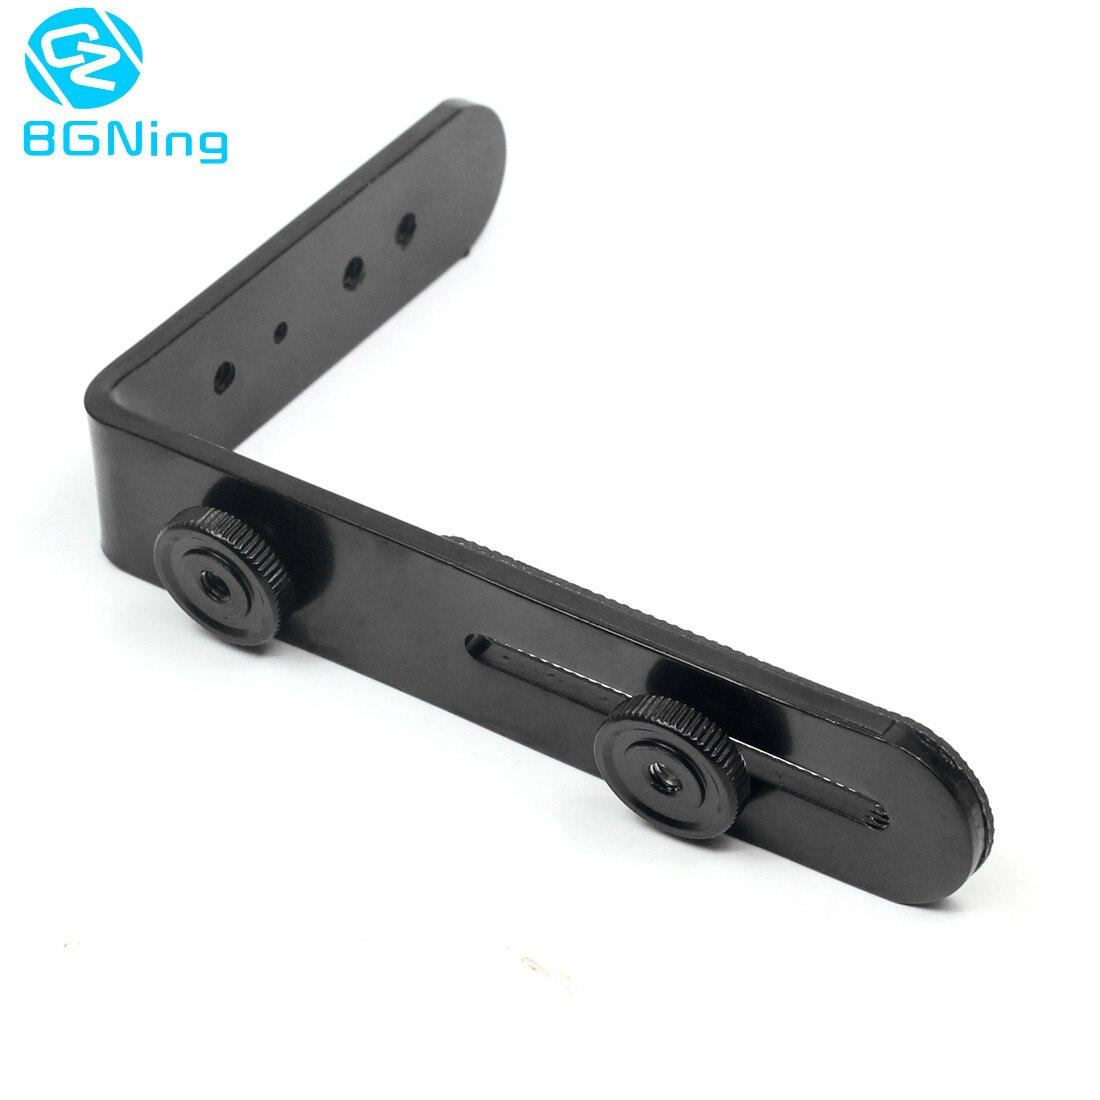 Alloy Single L 1 4 Screw Shaped Photo Studio Light Bracket Tripod Camera LED Flash Holder